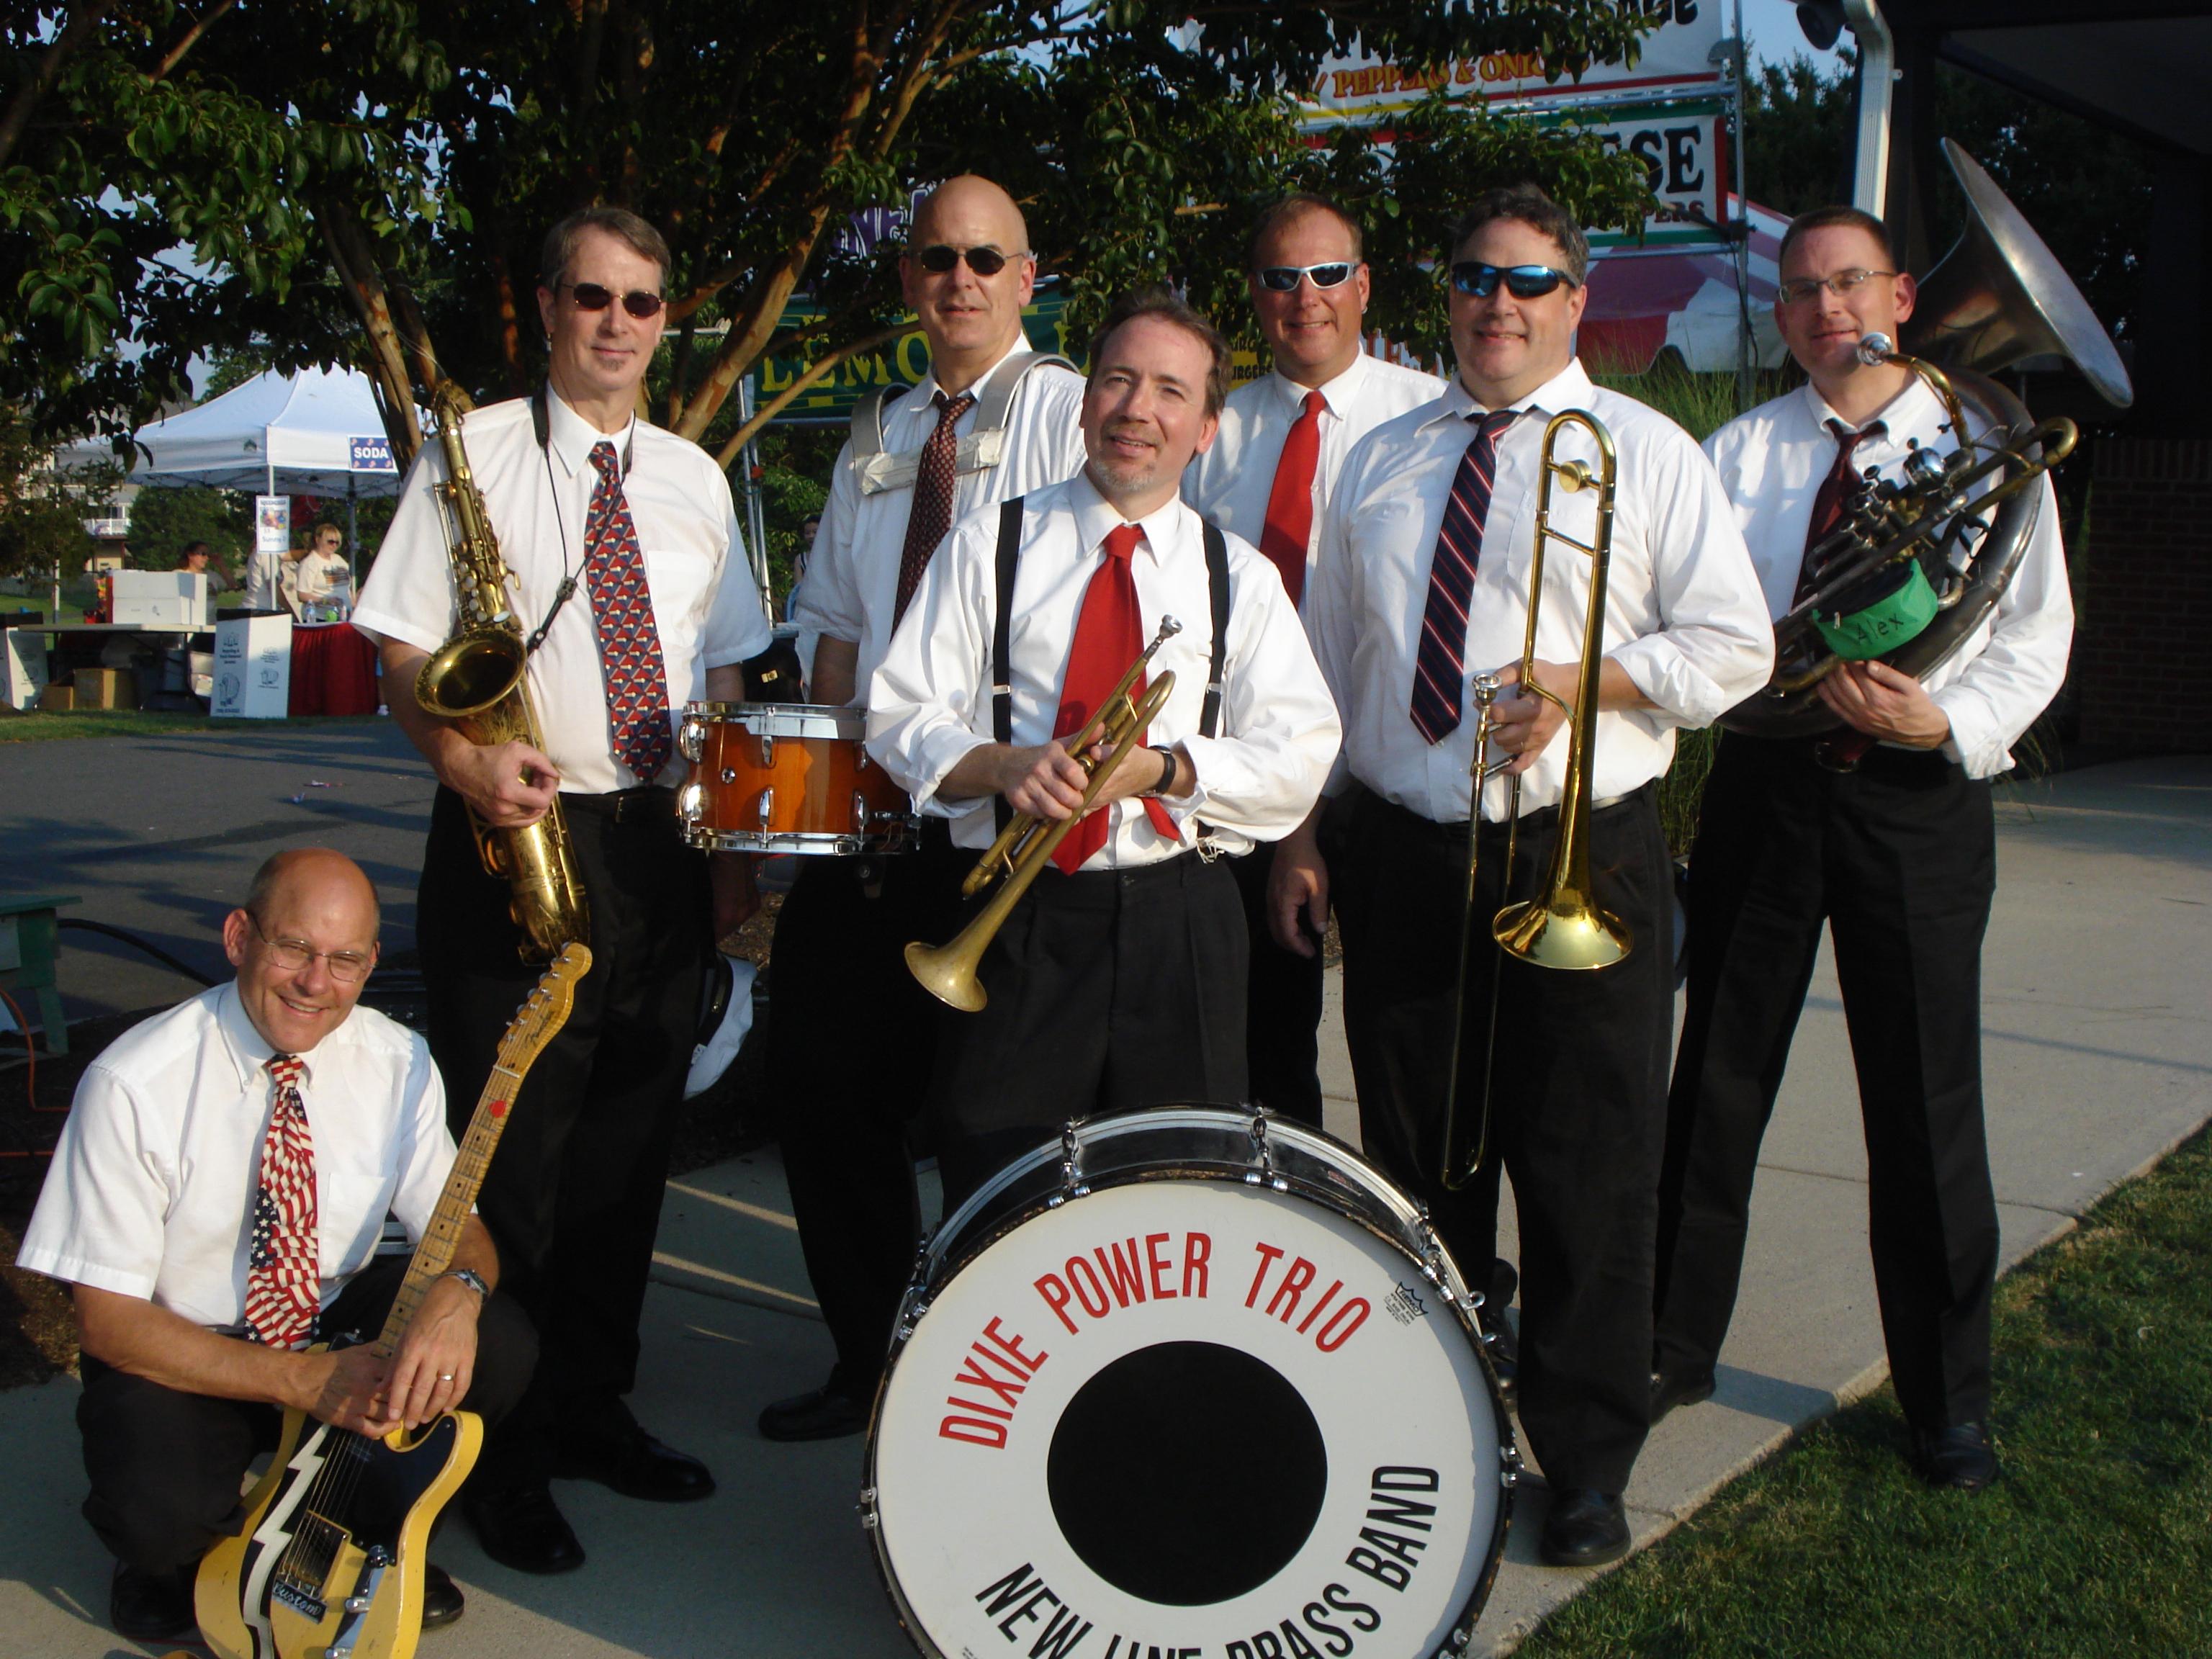 Zachary Smith and the Dixie Power Trio